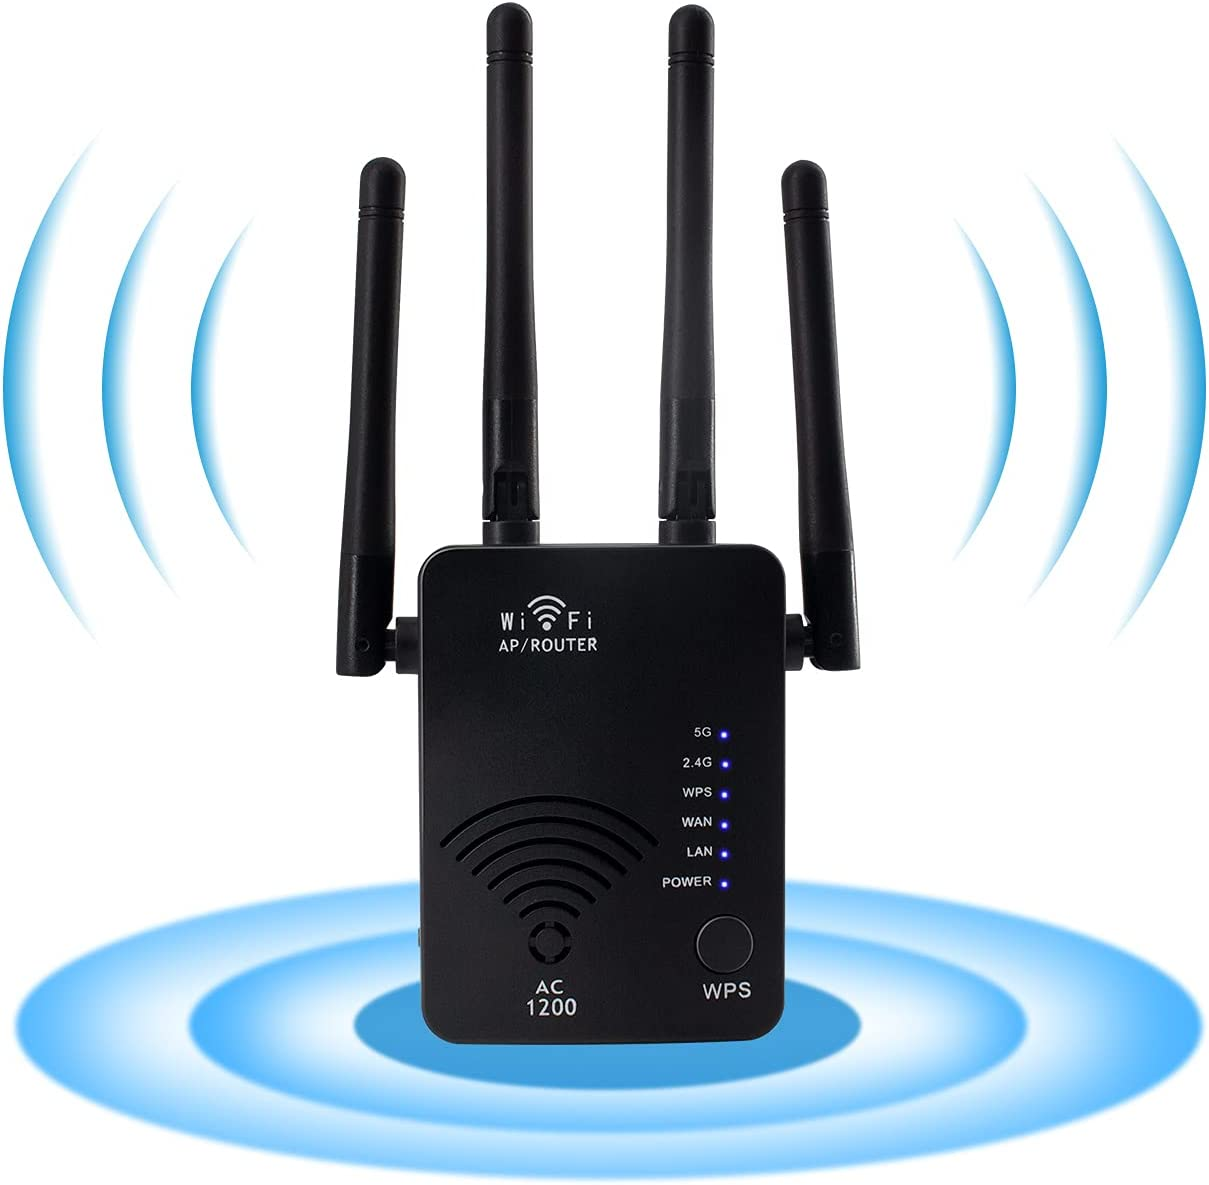 WiFi Finally resale start Mesa Mall Range Extender 1200Mbps Wireless Internet Re Signal Booster